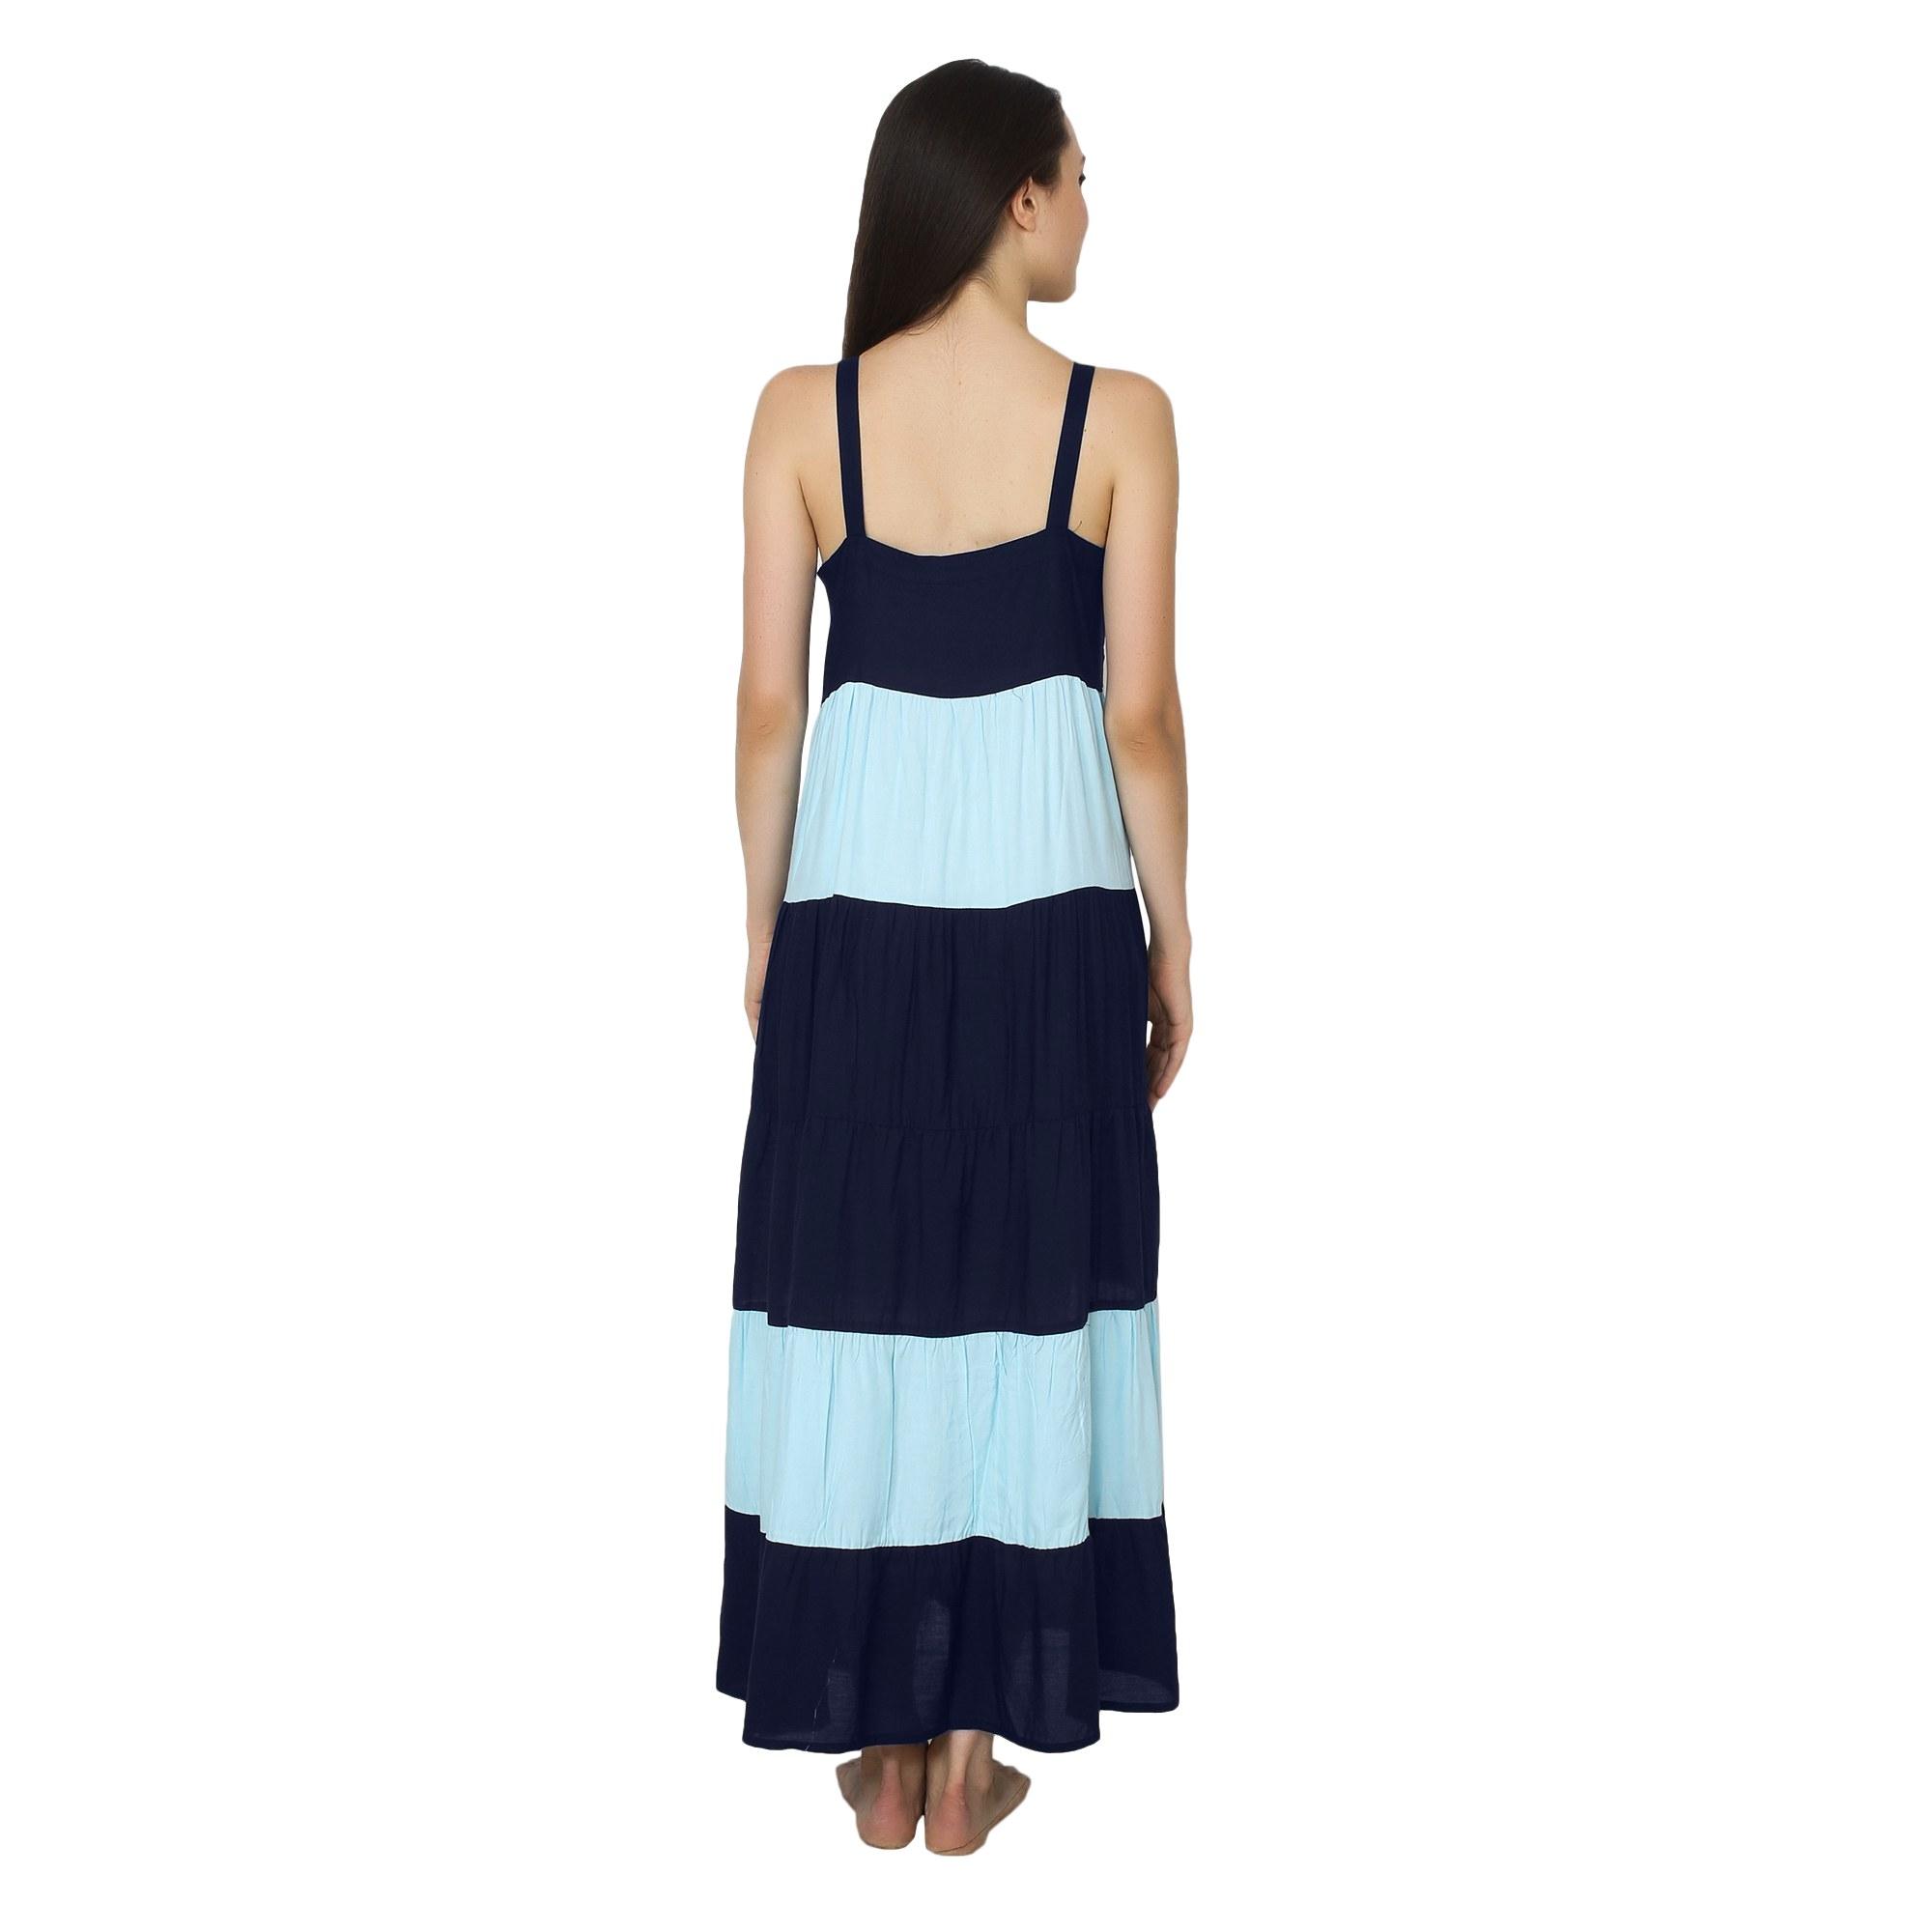 Spaghetti Strap Pleated Frilled Nighty Dress Gown in Dark Blue:Light Blue